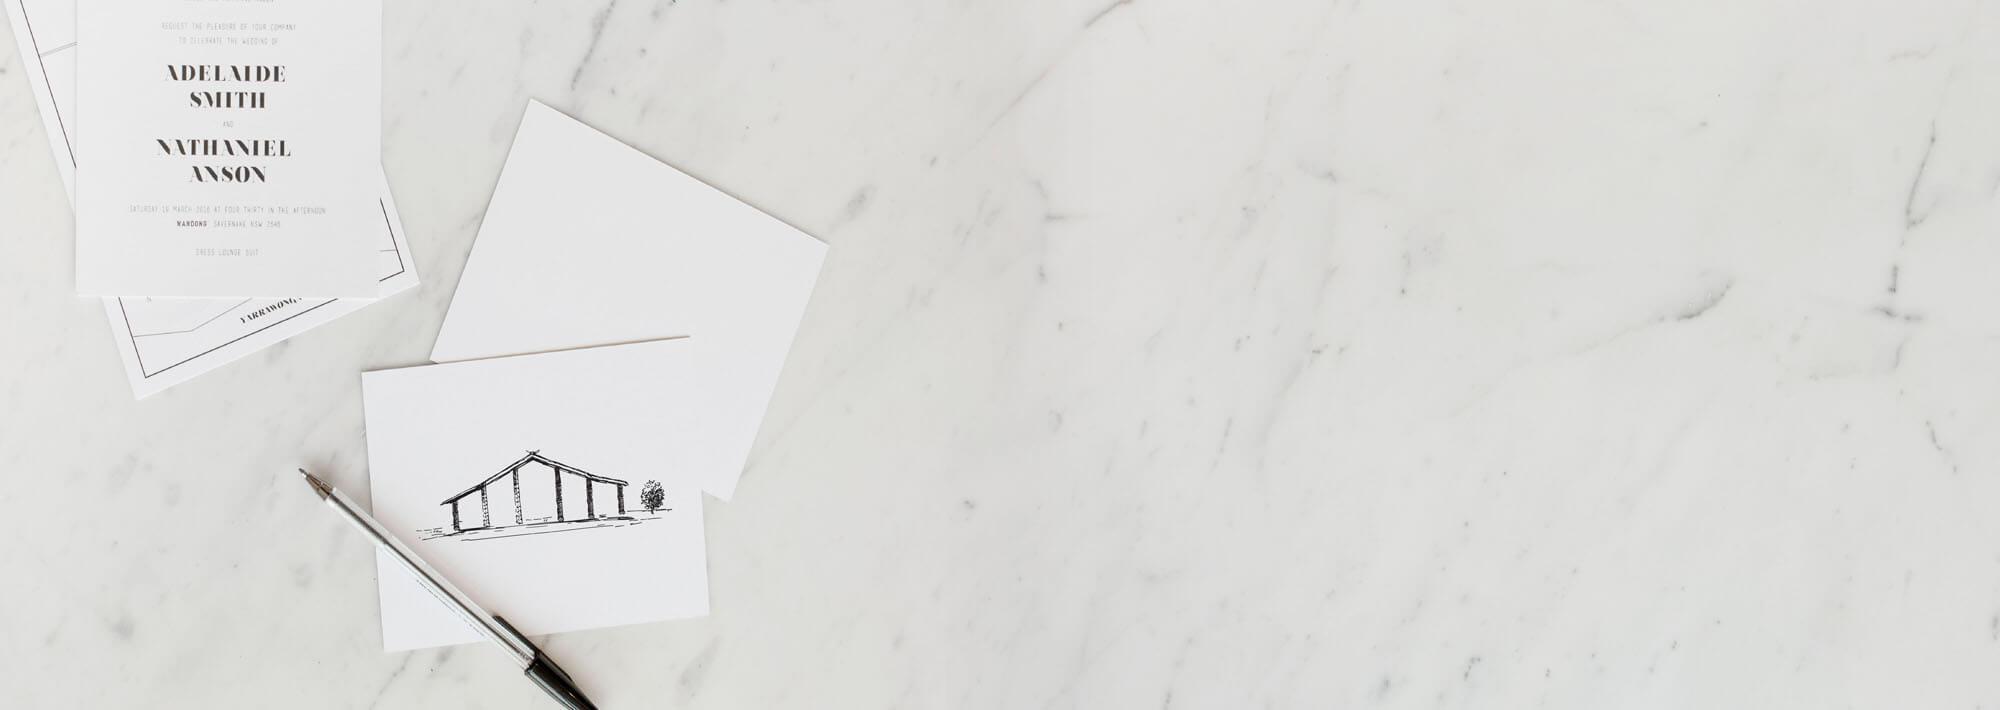 custom wedding invitations paperlust